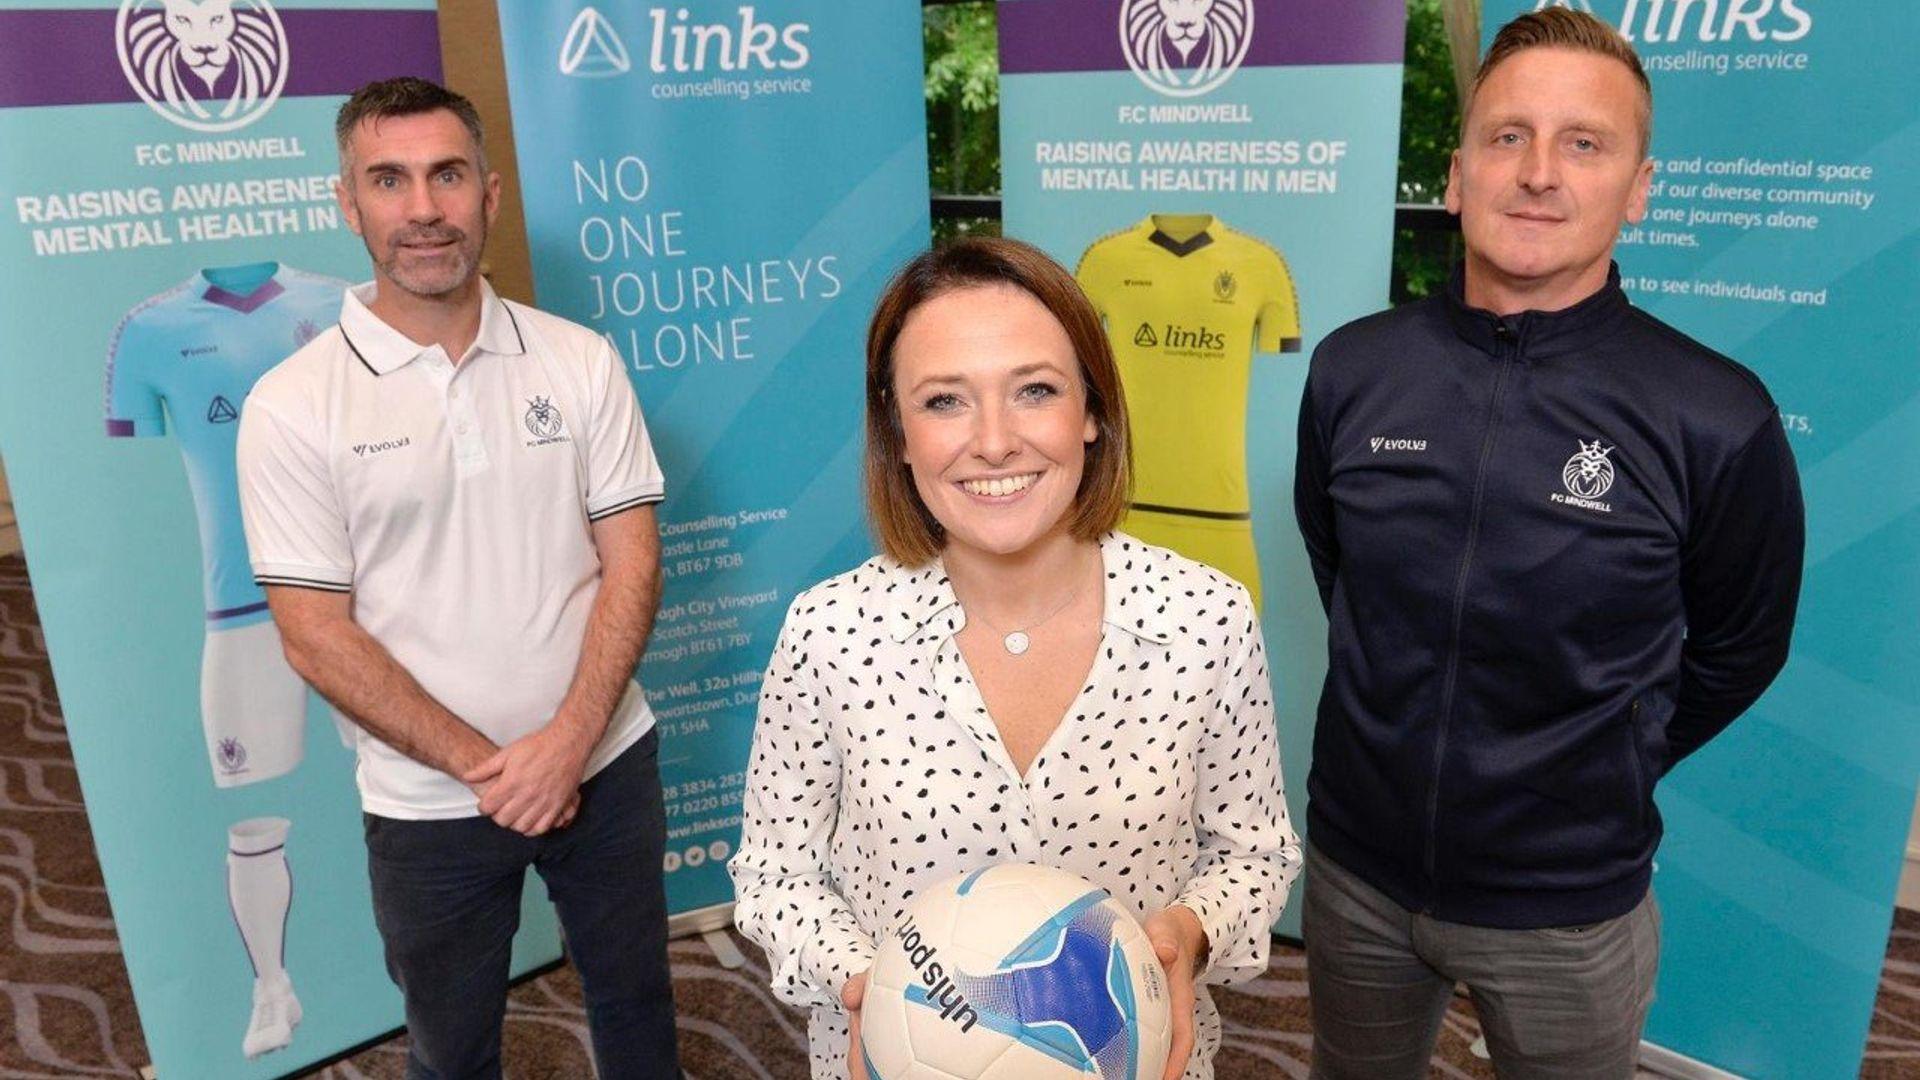 Ex-Man Utd, Newcastle winger joins FC Mindwell